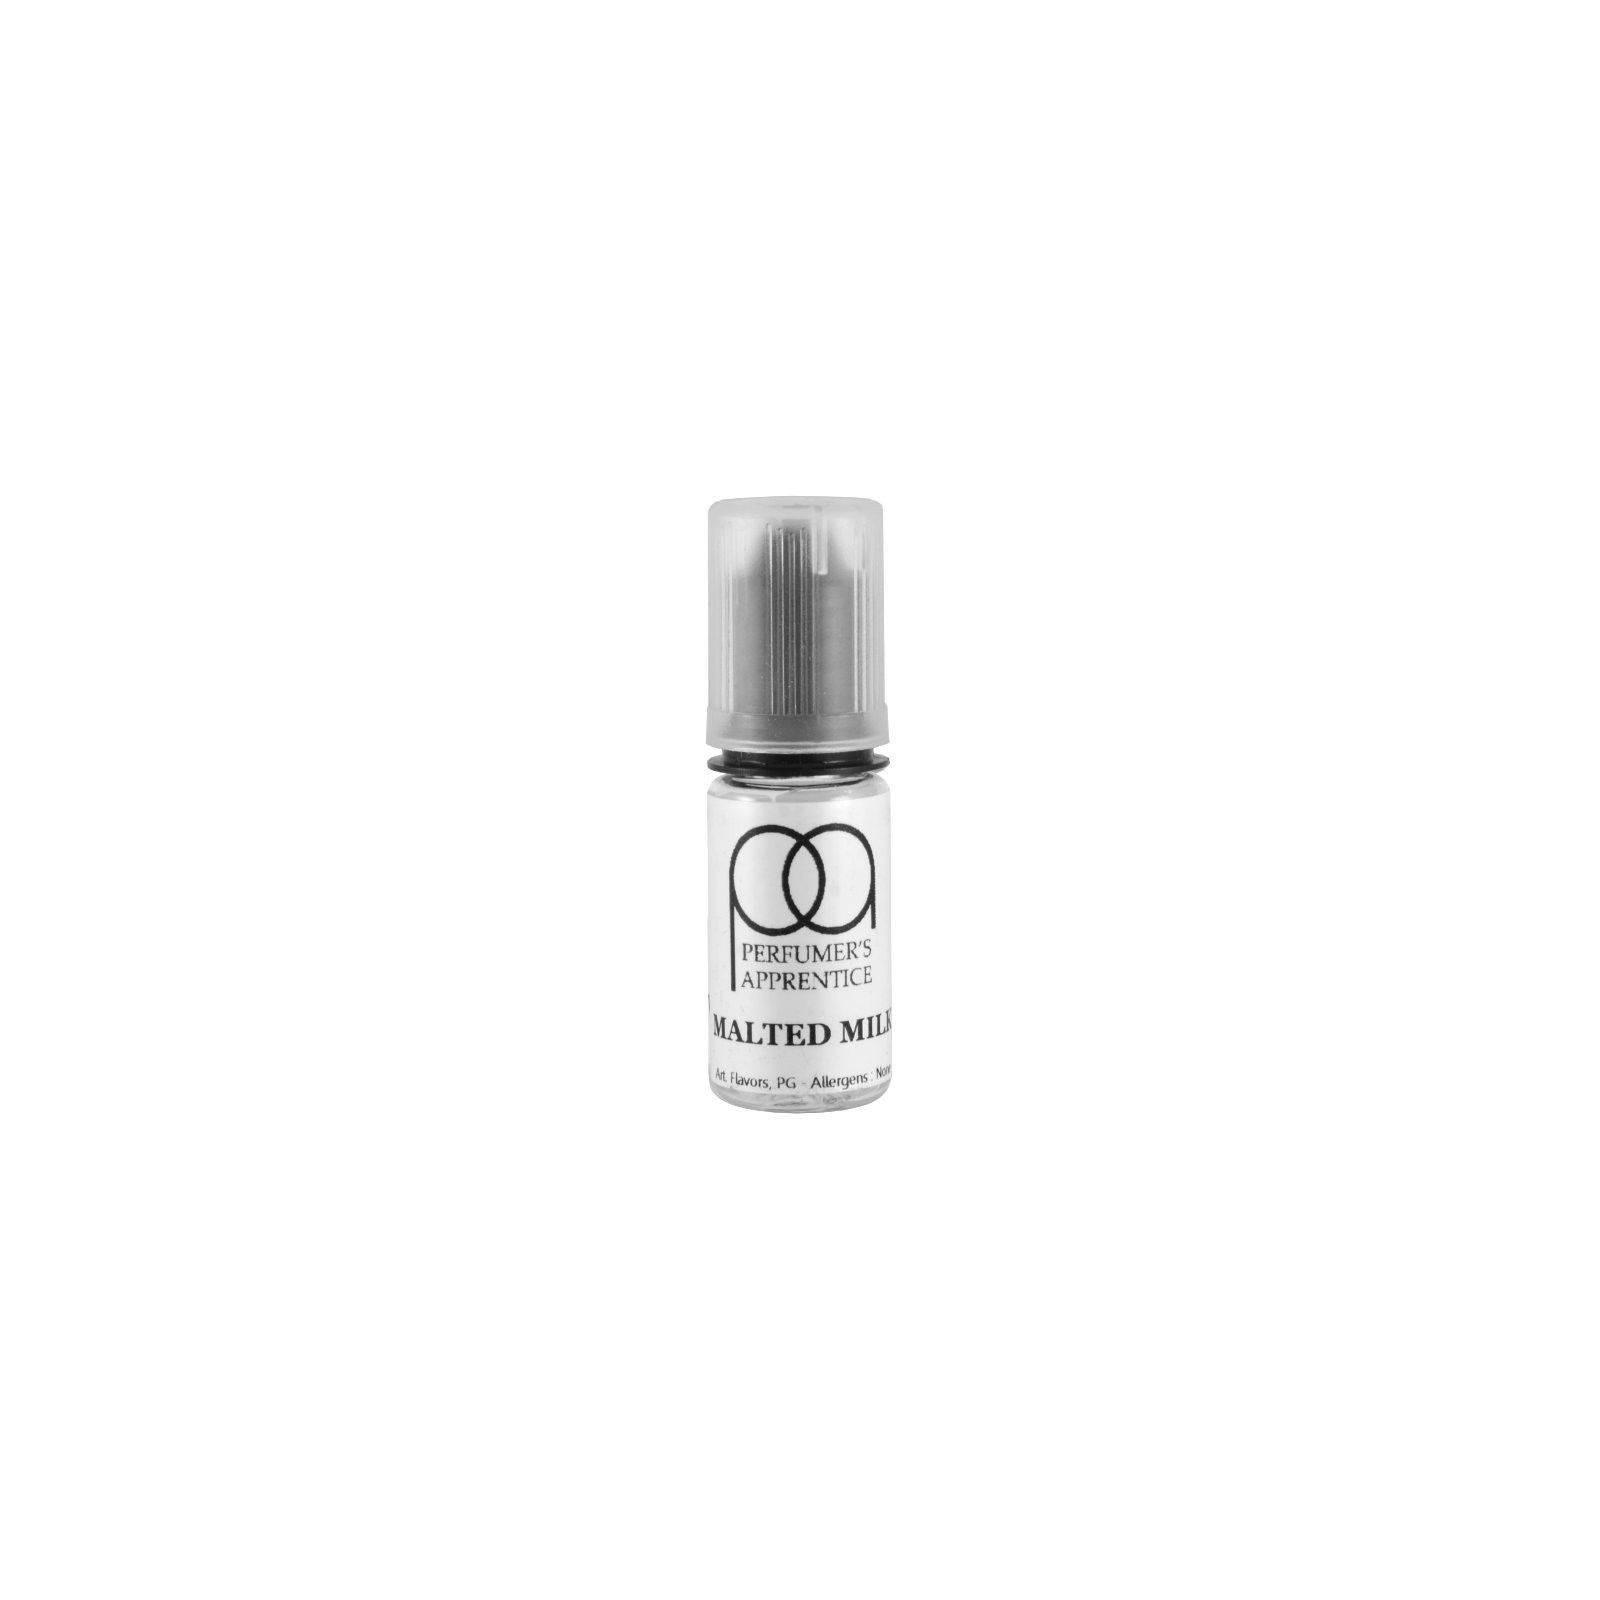 Concentré Malted Milk - Perfumer's Apprentice